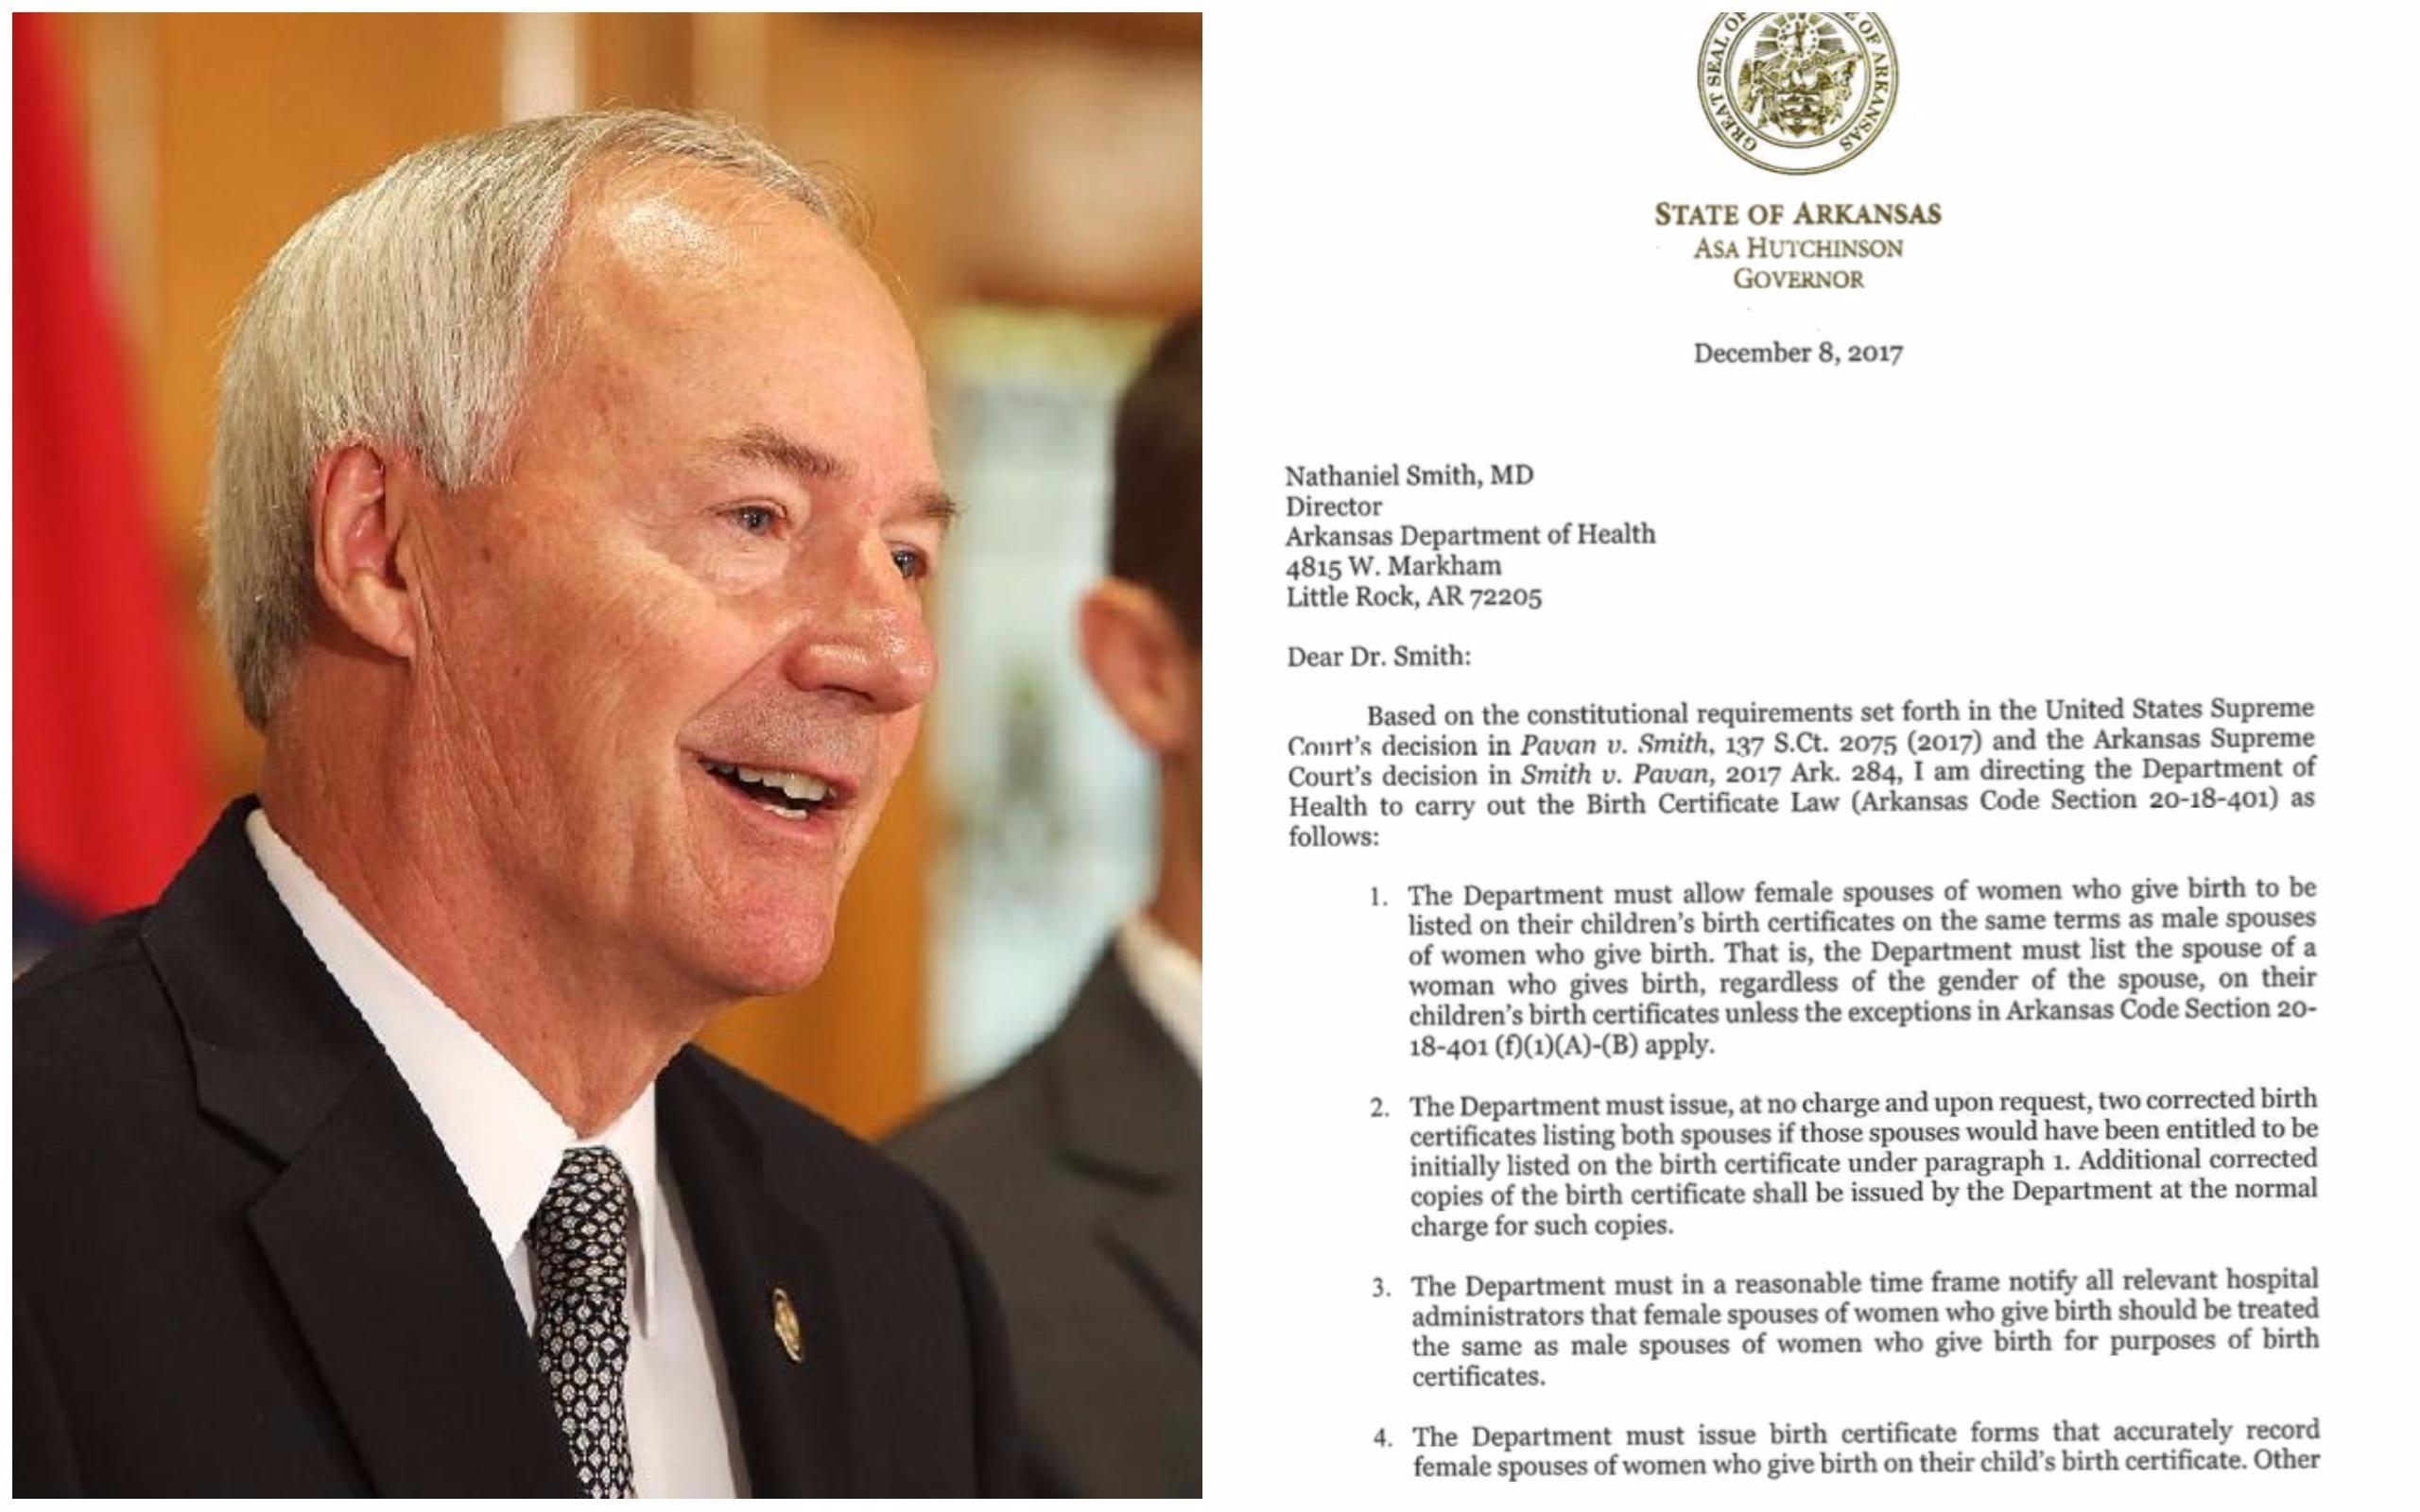 Arkansas governor sets birth certificate changes agency restarts arkansas governor sets birth certificate changes agency restarts issuing documents hours after judges halt aiddatafo Choice Image